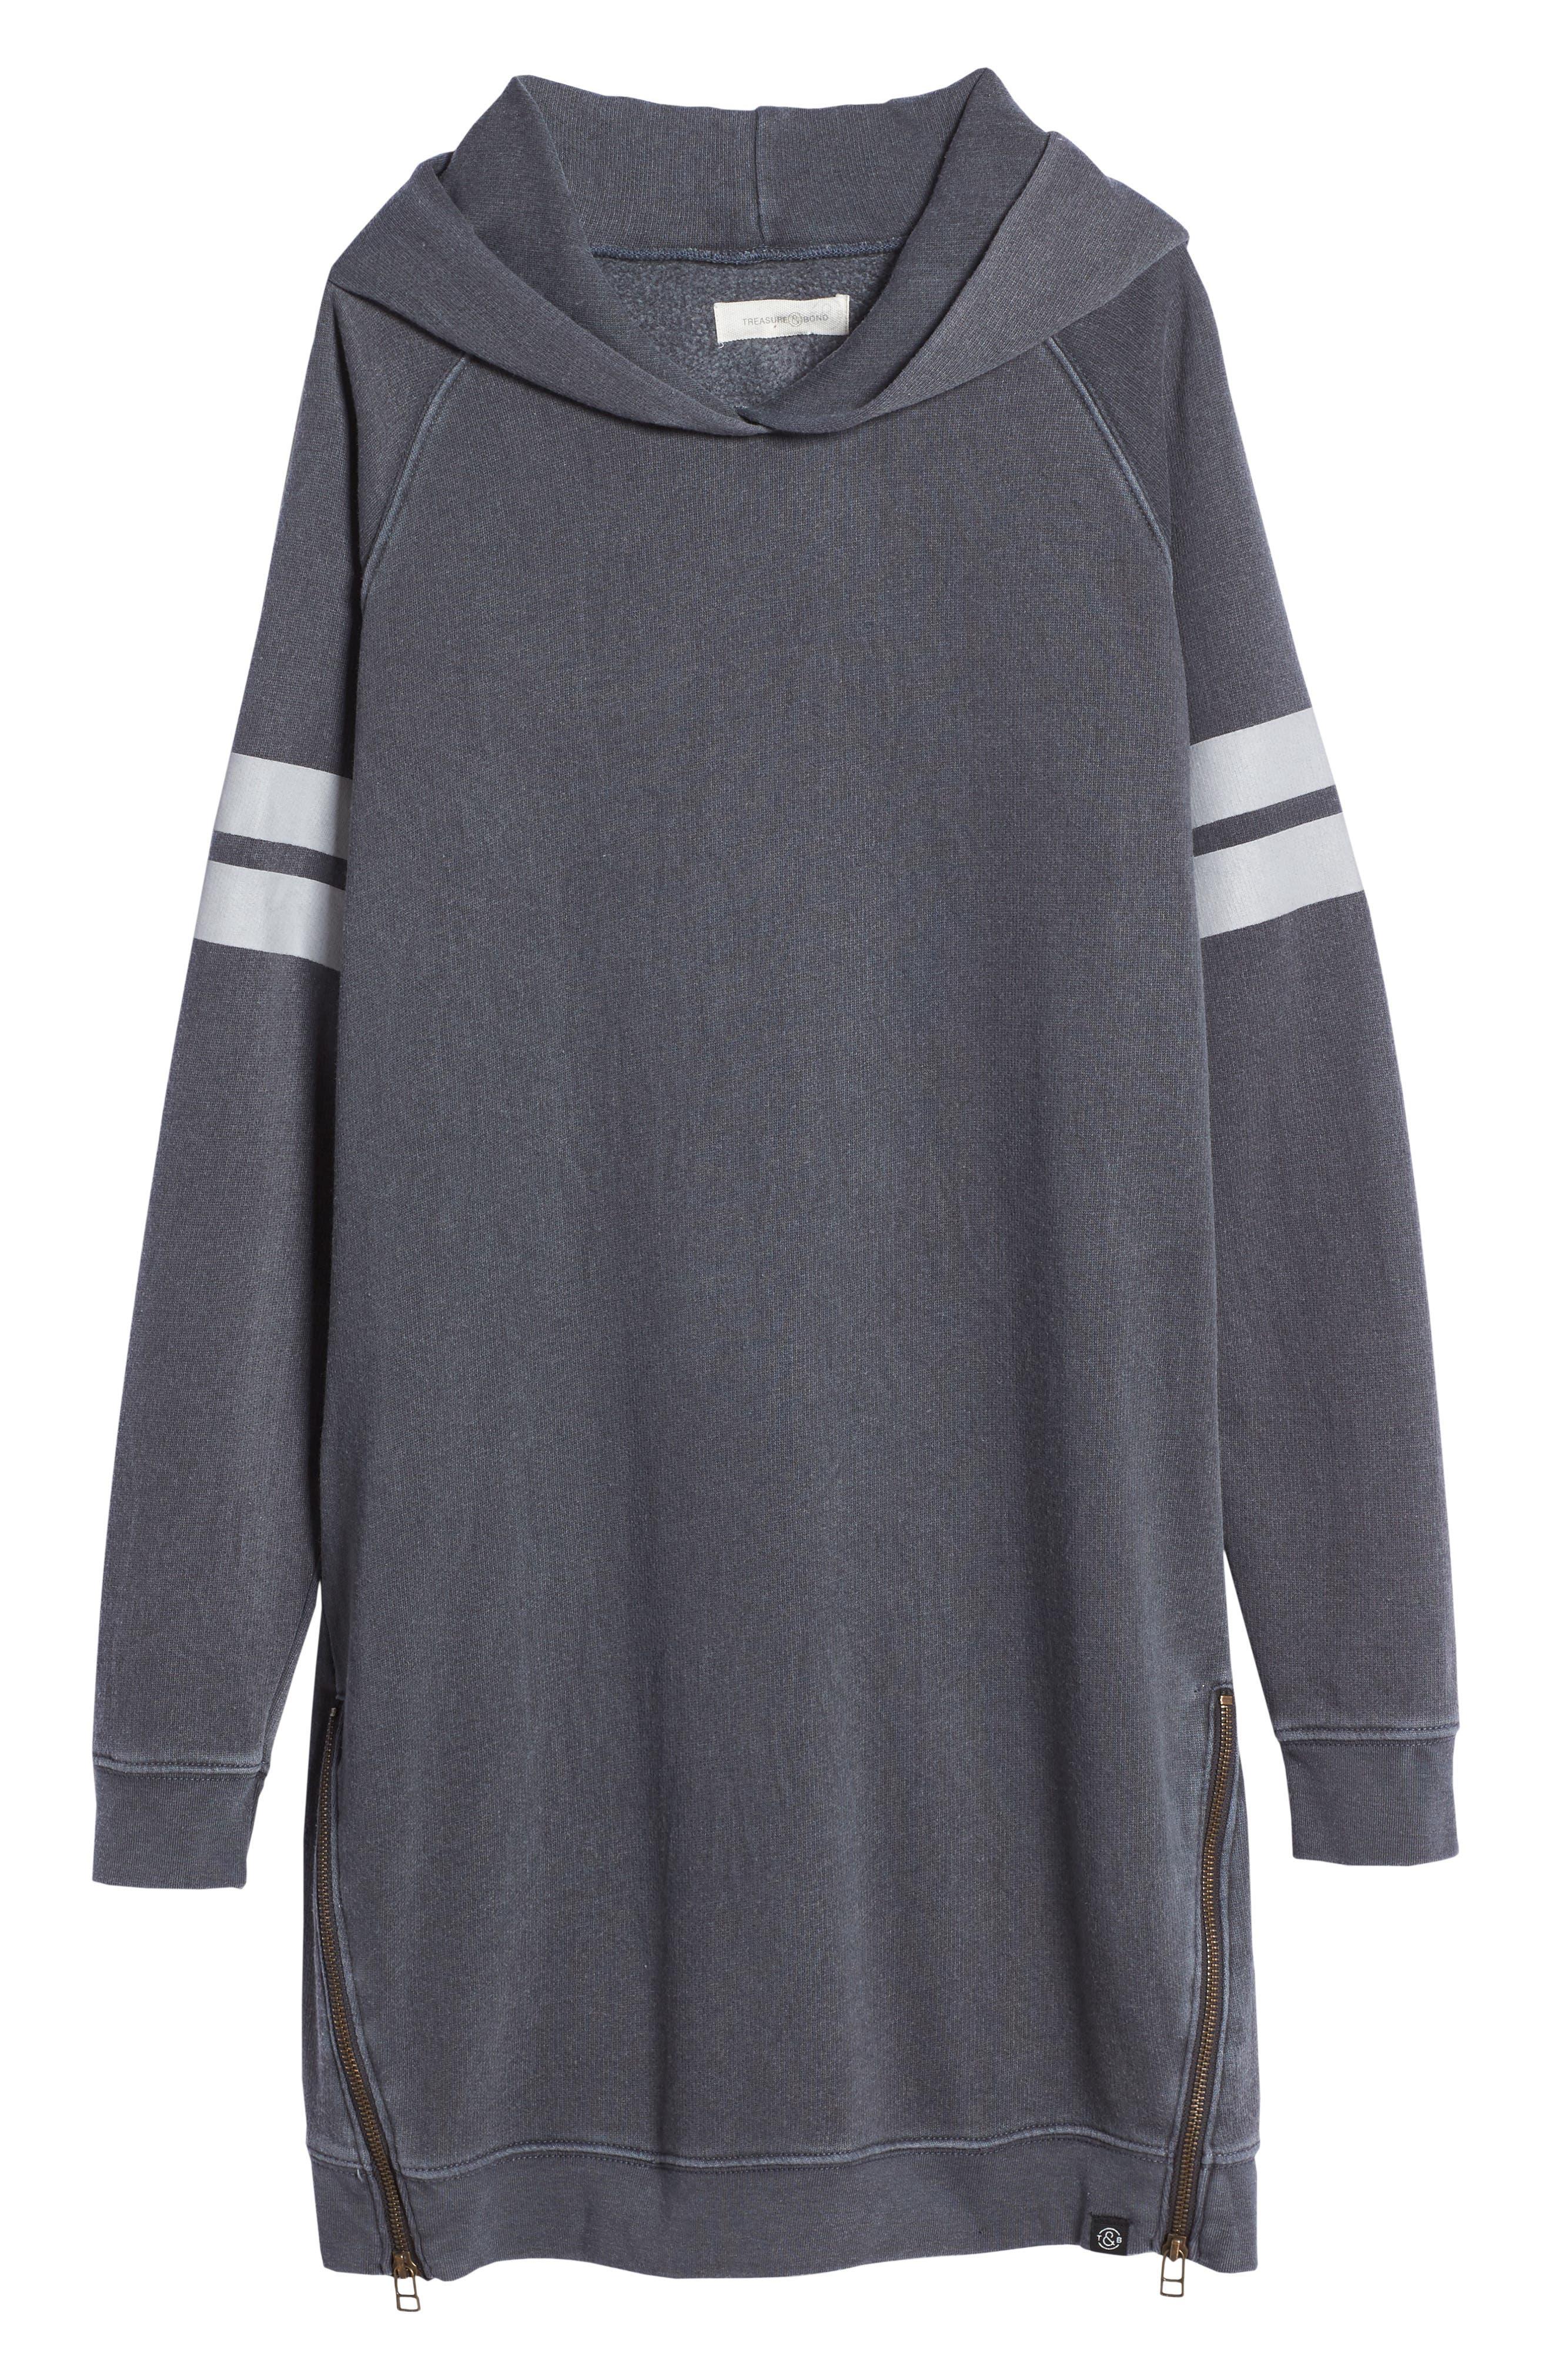 Alternate Image 1 Selected - Treasure & Bond Hooded Fleece Sweatshirt Dress (Big Girls)